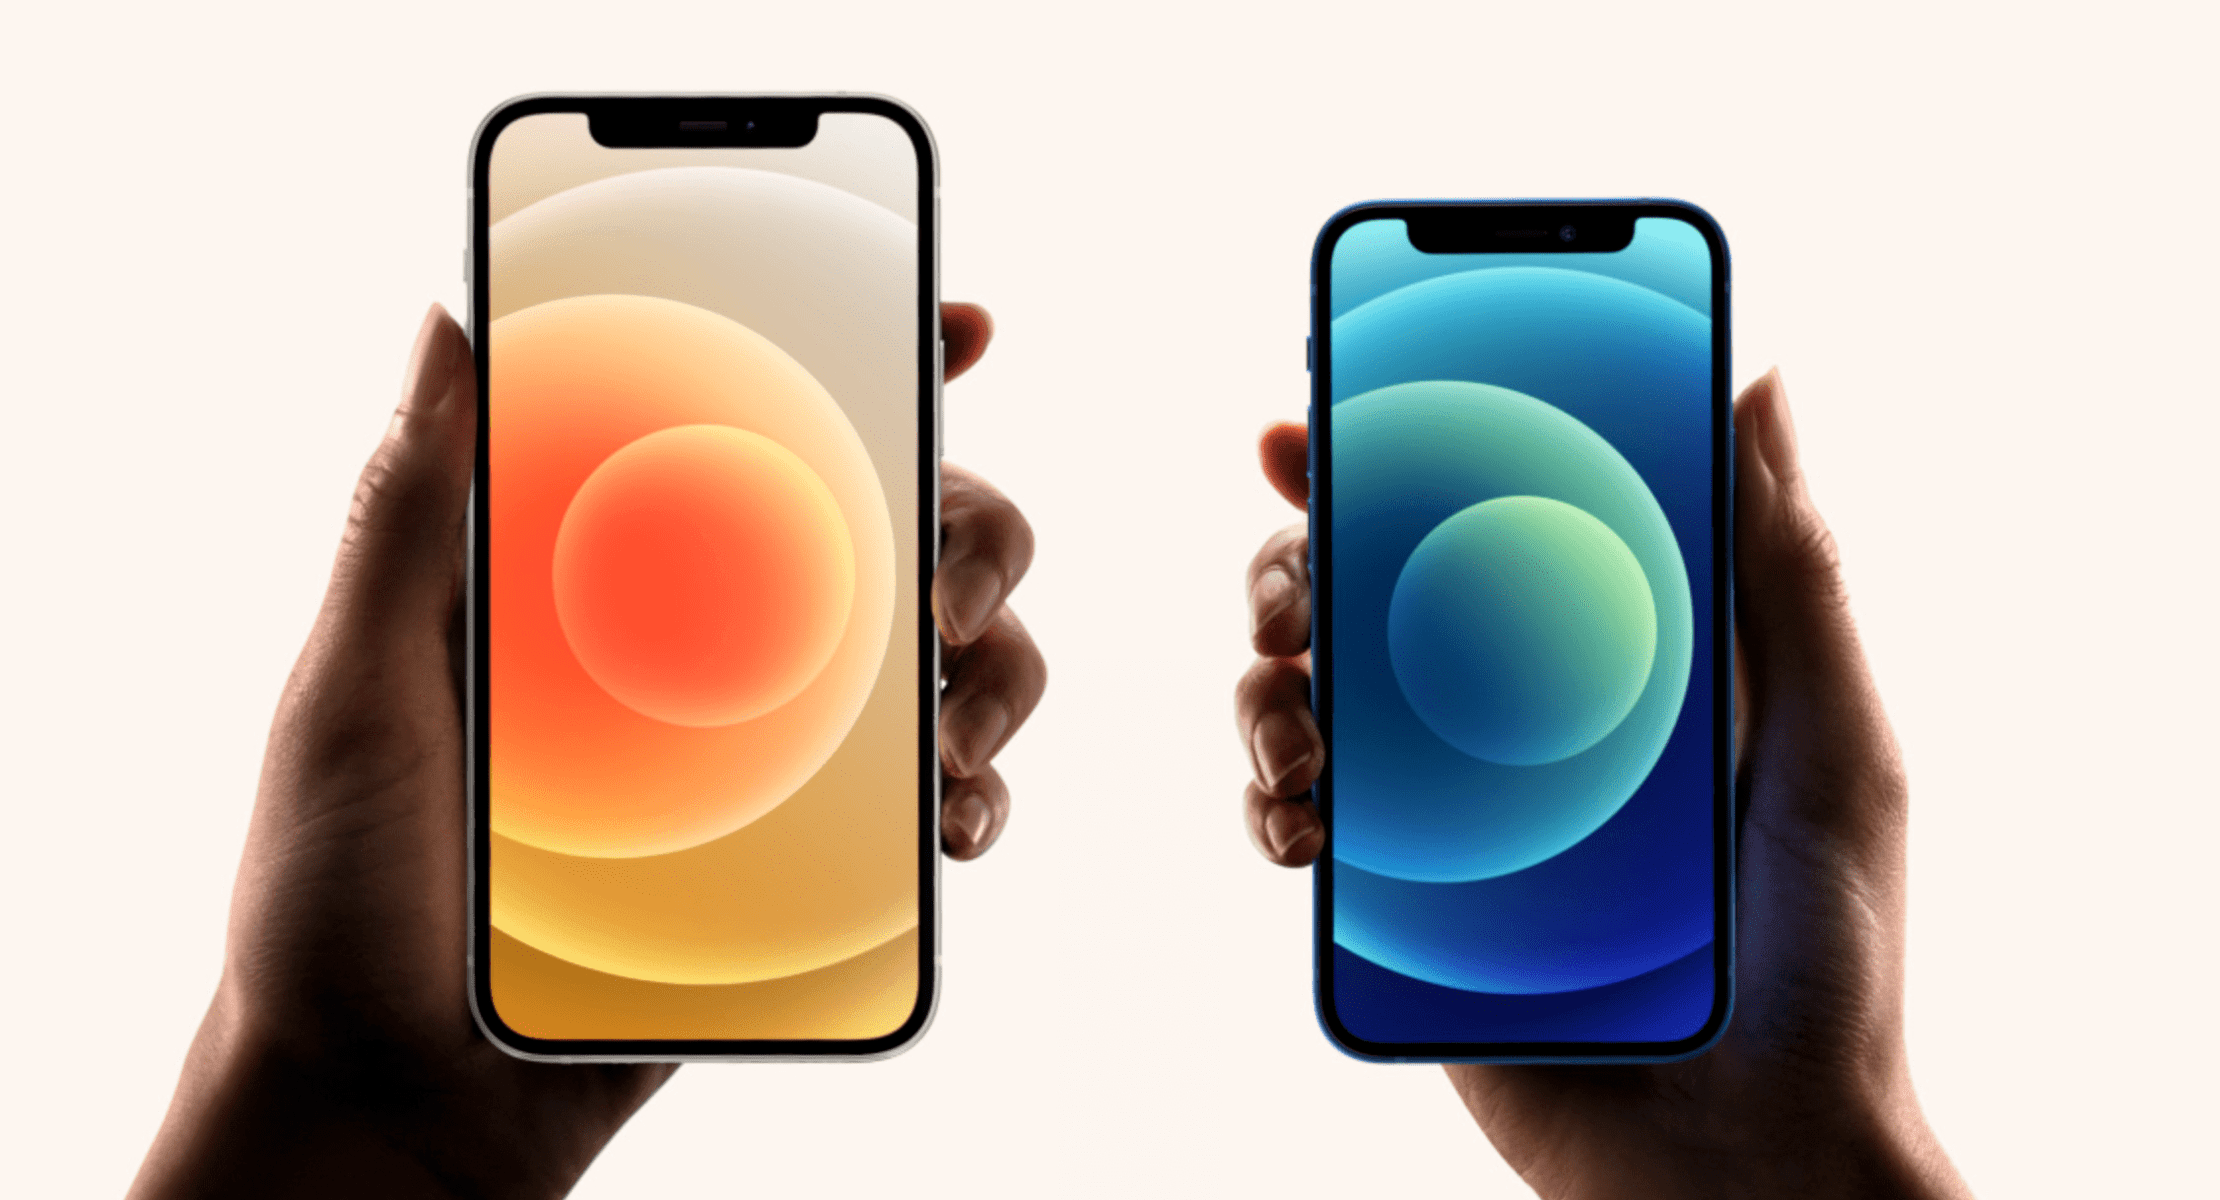 Apple прекращает выпуск iPhone 12 Pro, iPhone 12 Pro Max и iPhone XR и снижает цены на старые модели